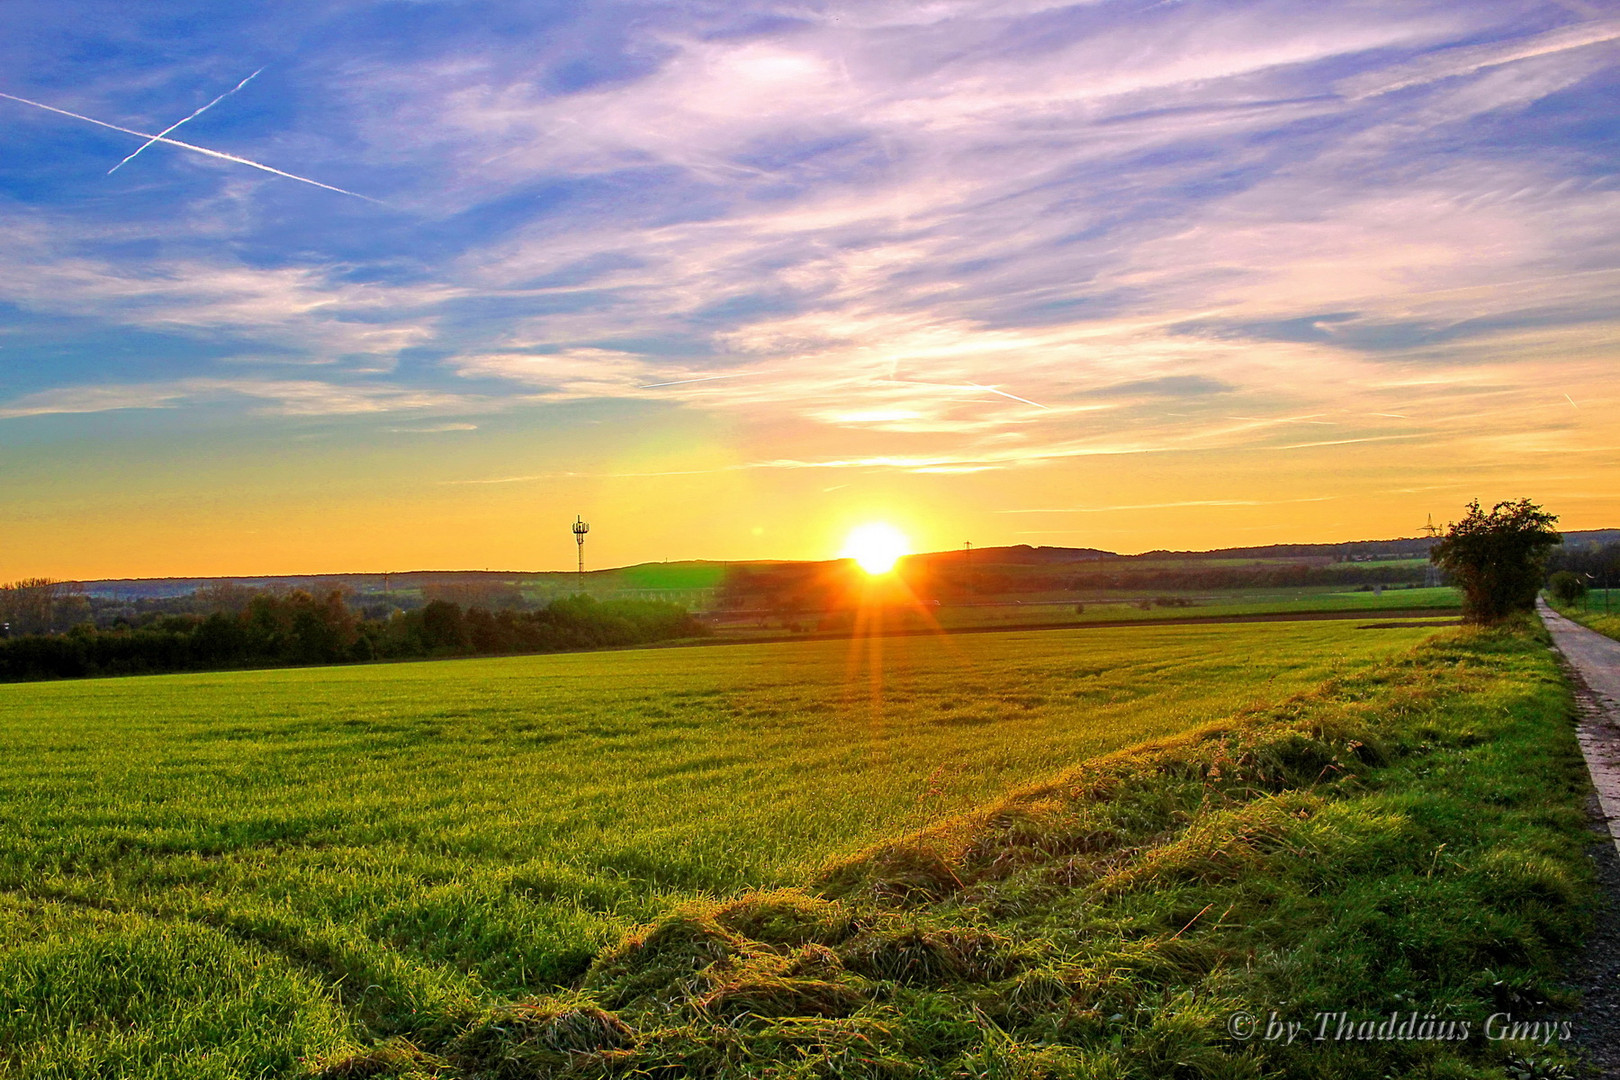 Sonnenuntergang Rosdorf papenberg ein Blick Richtung Olenhausen